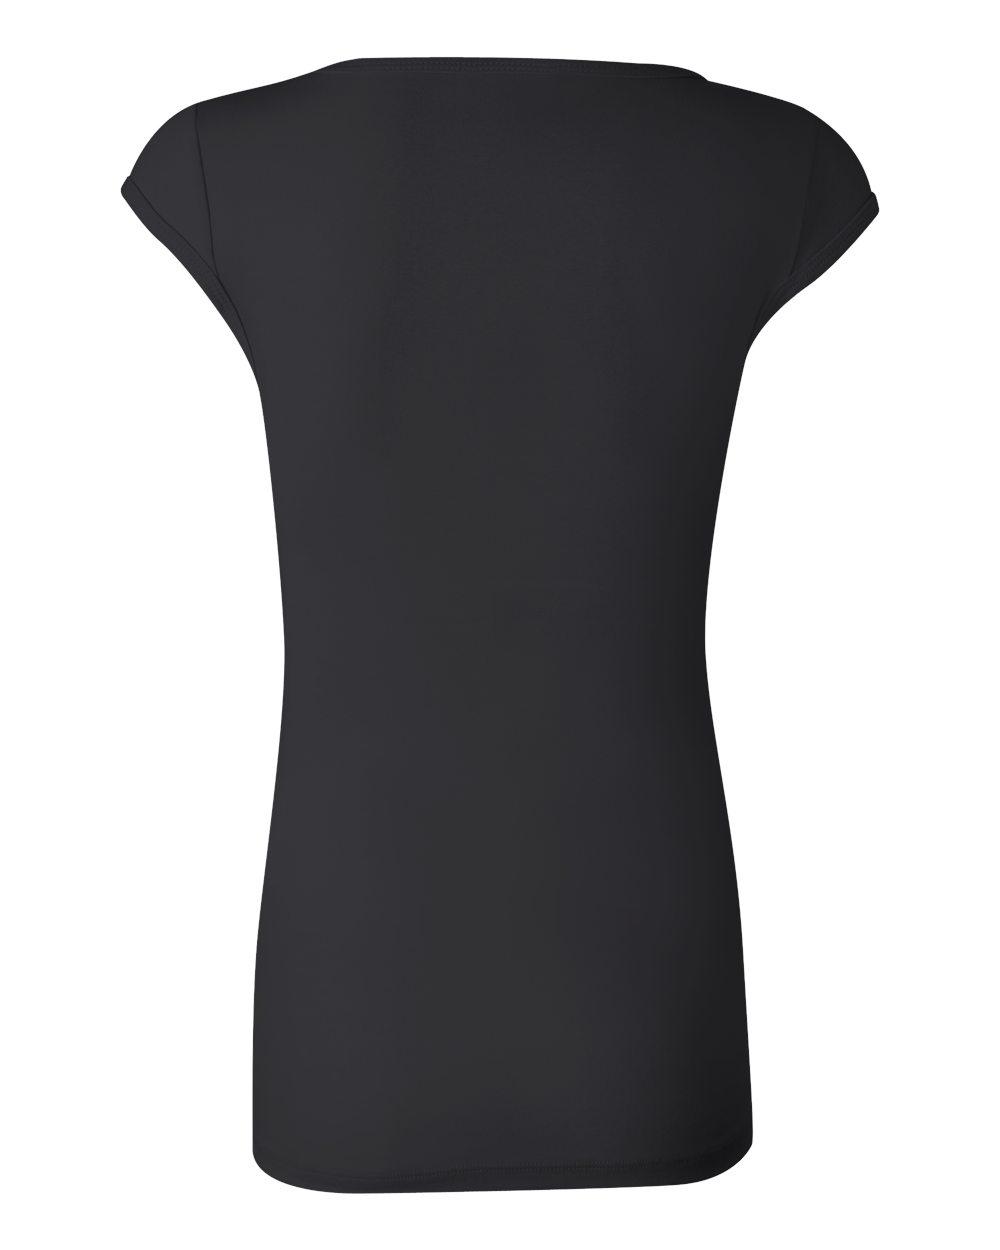 Bella-Canvas-Women-039-s-Sheer-Mini-Rib-Cap-Sleeve-Deep-V-Neck-T-Shirt-B8705-S-2XL thumbnail 17